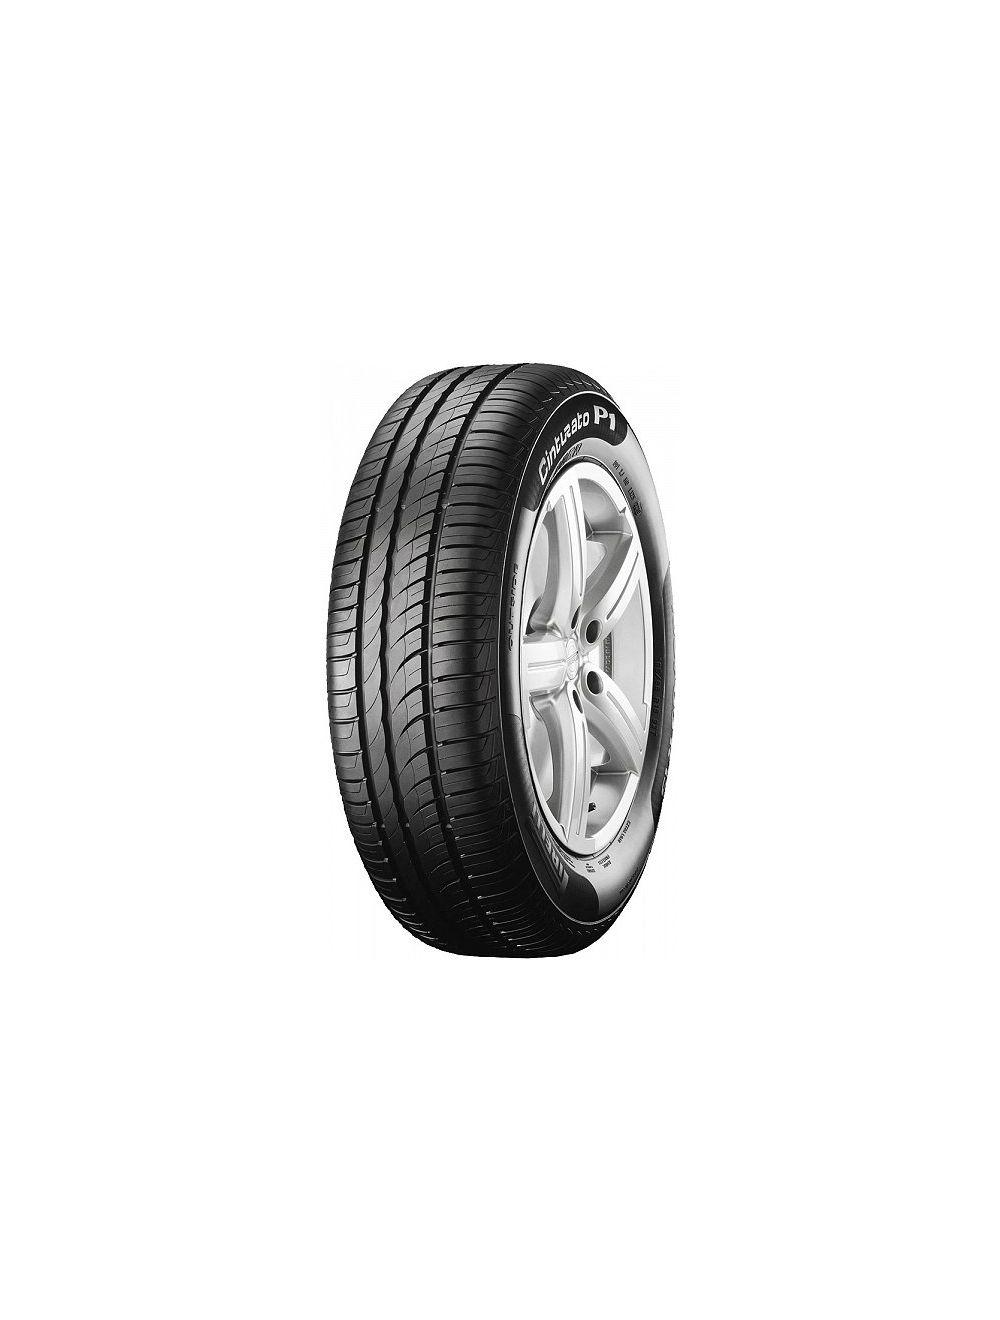 Pirelli 195/55R16 V P1 Cinturato RunFlat * Nyári gumi